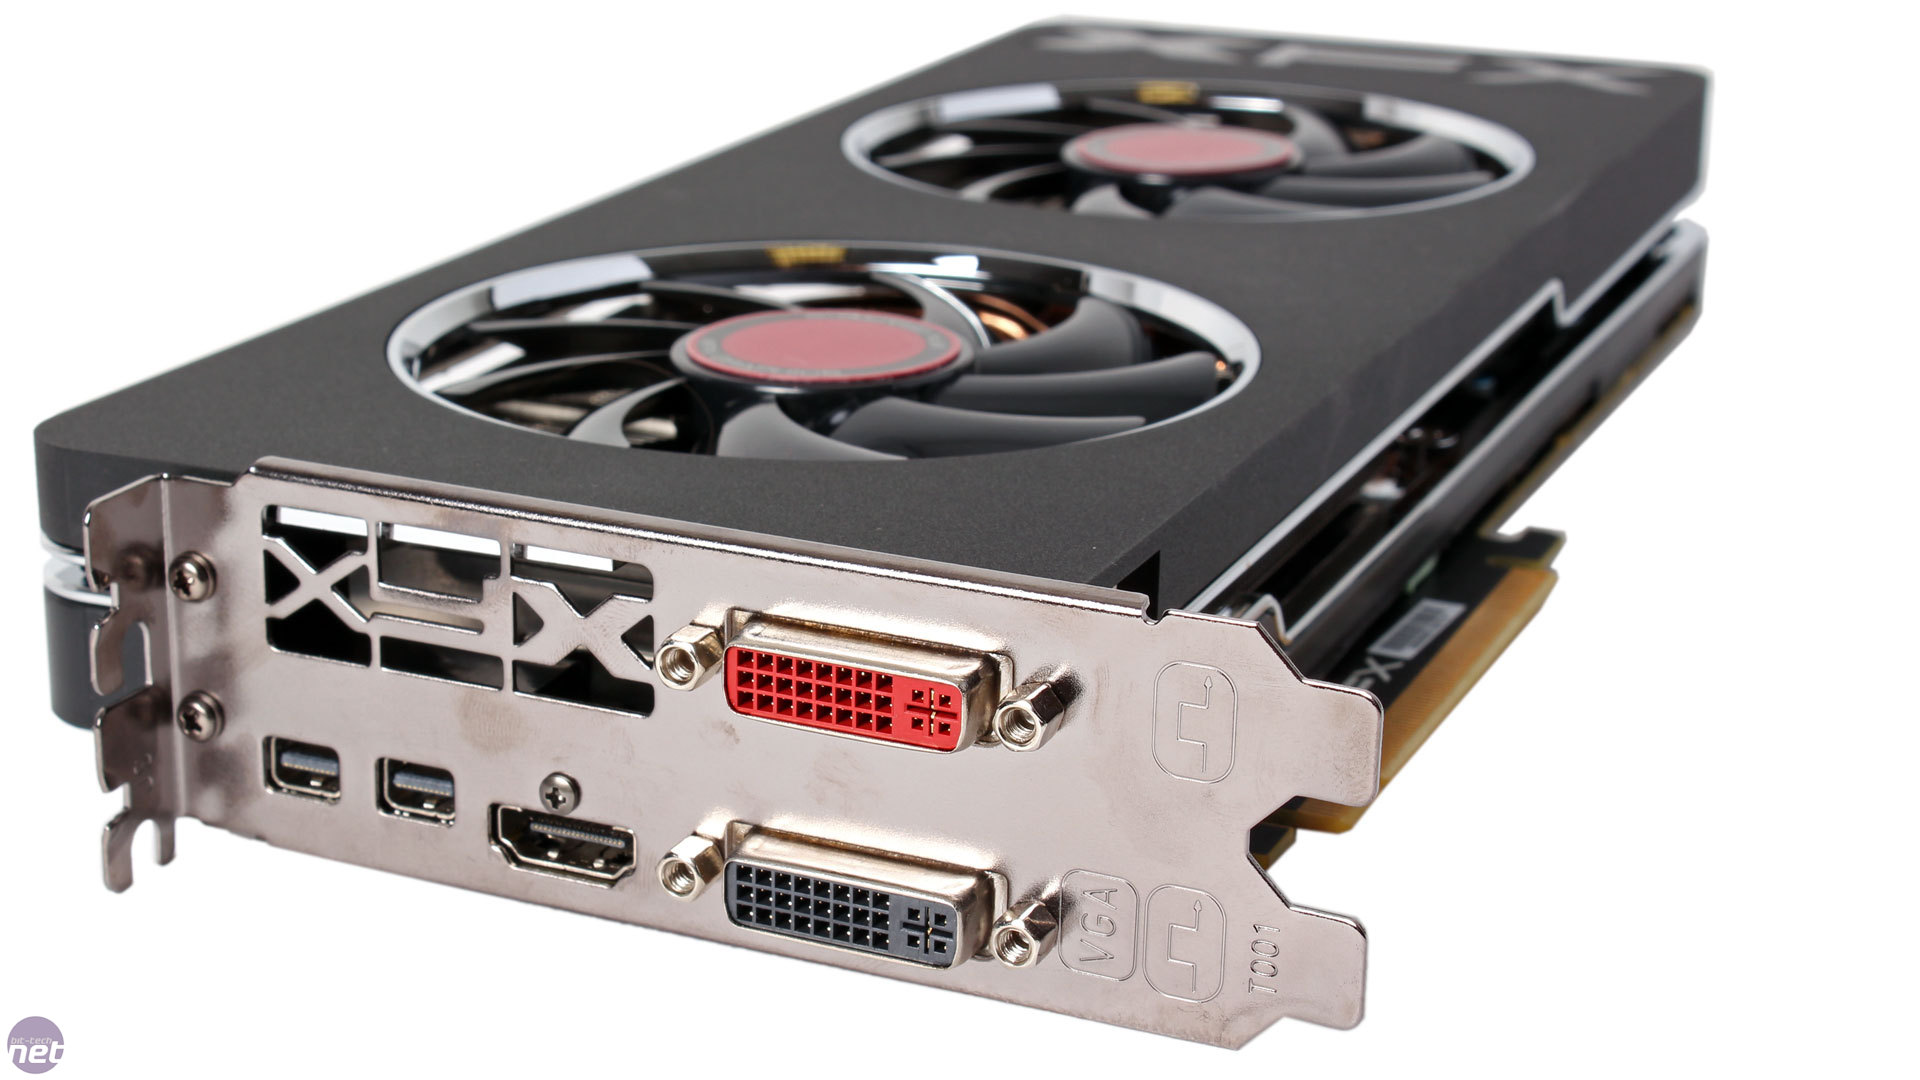 AMD Radeon R9 280 Review feat  XFX   bit-tech net